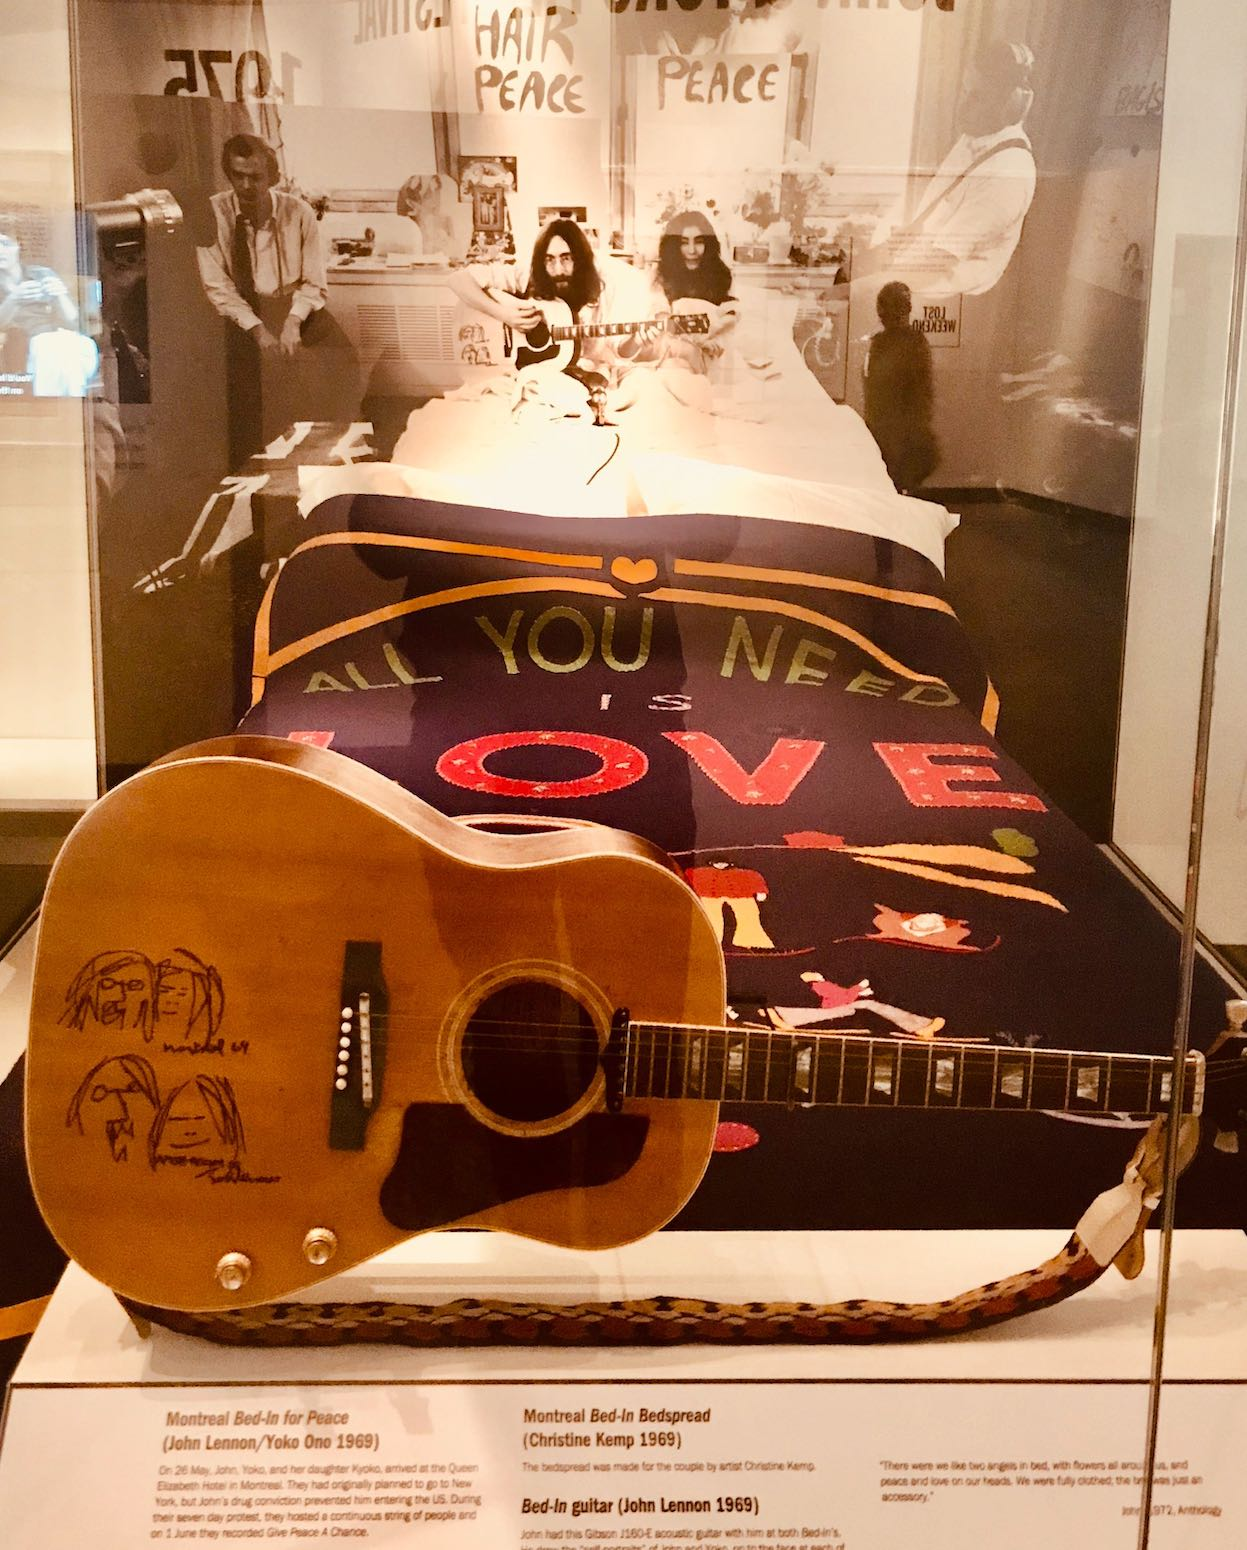 Montreal Bed-In bedspread Double Fantasy John and Yoko Exhibition Liverpool